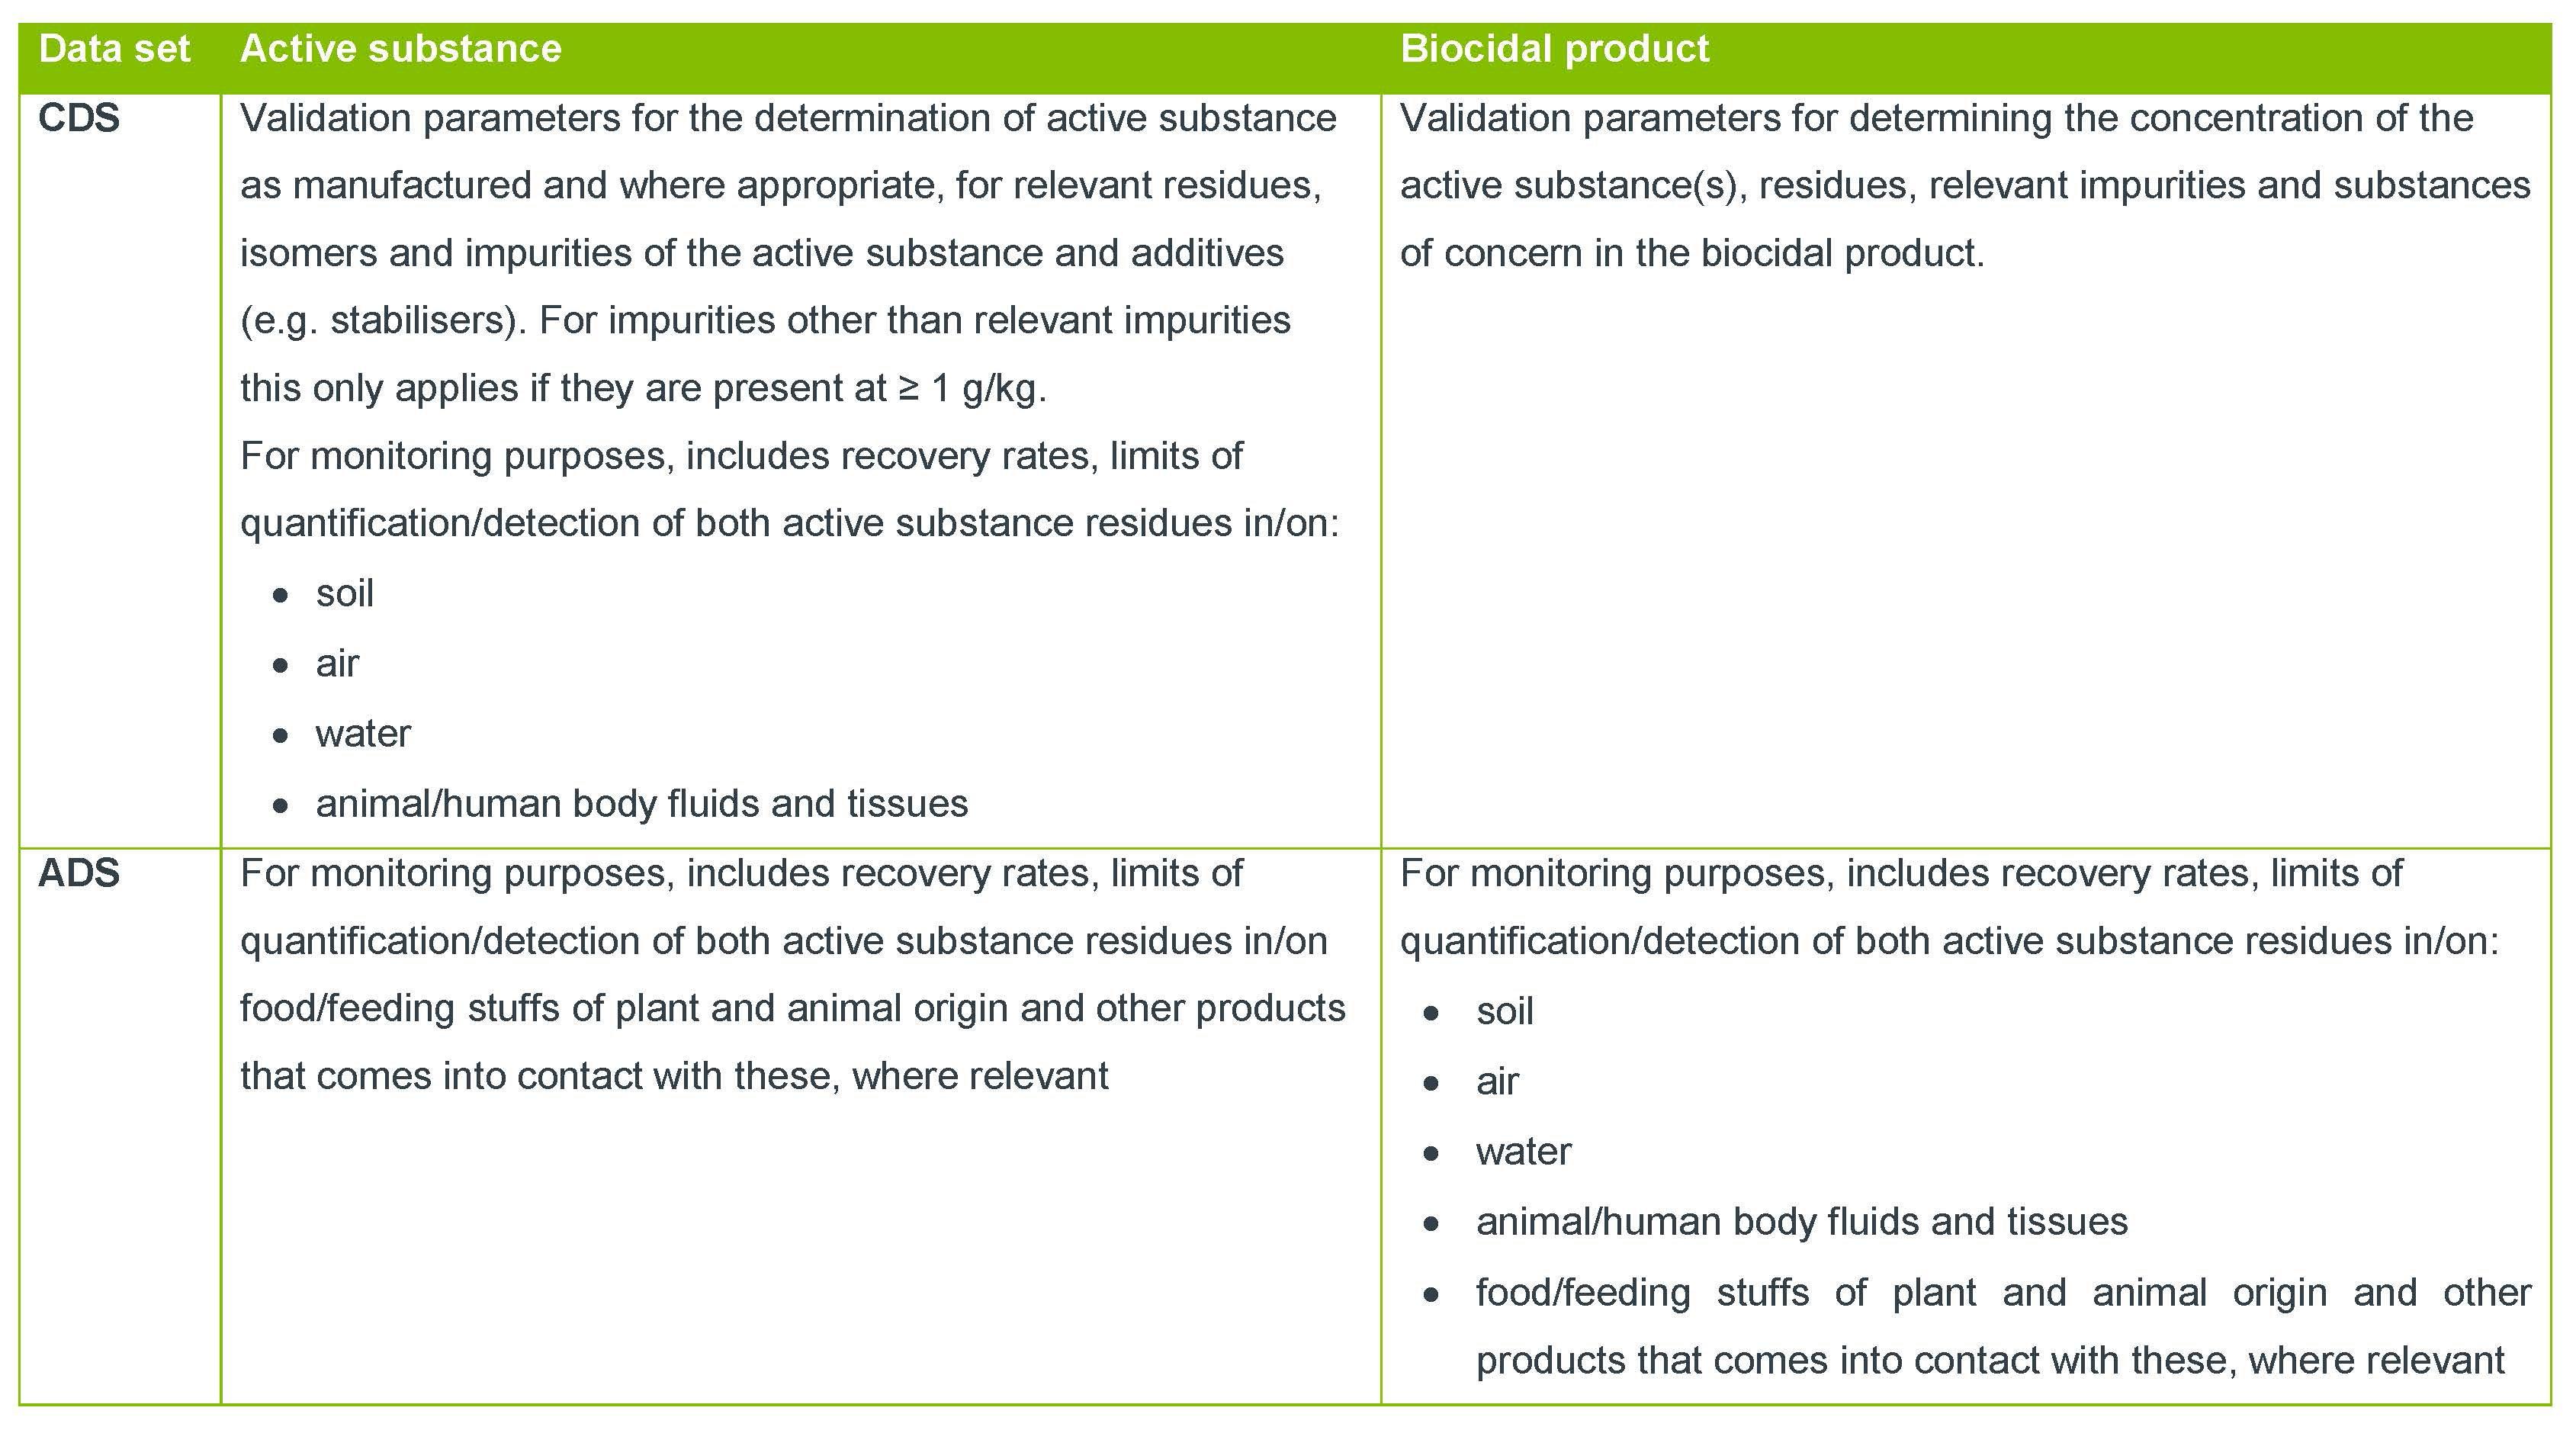 C329 [Blog] Biocides 1 - Biocidal Products Regulation_v2_table only_FINAL